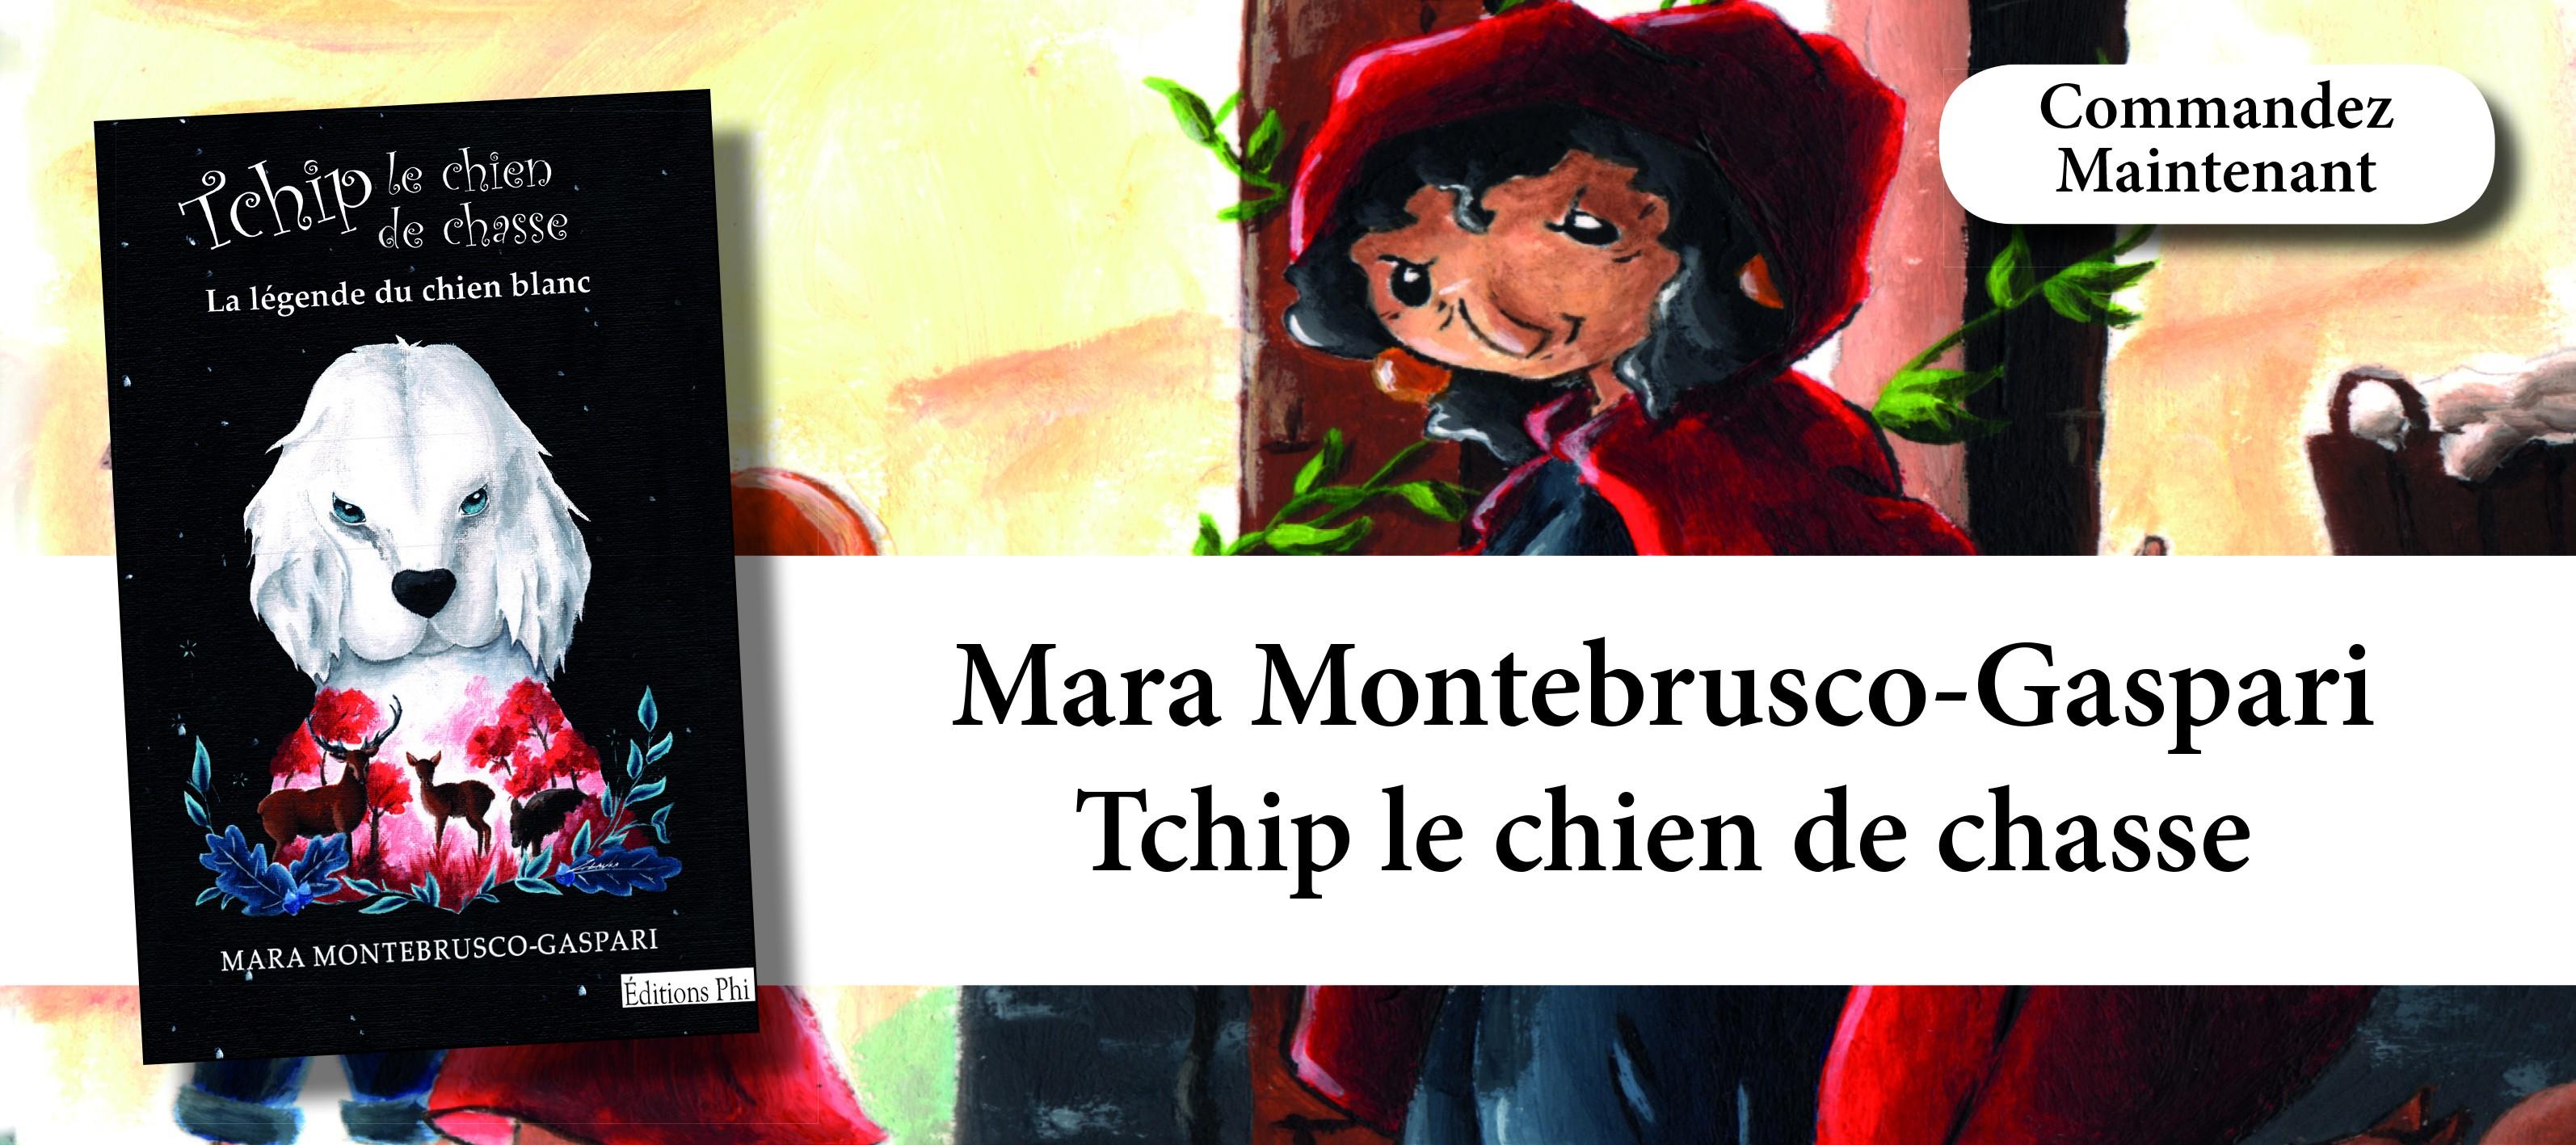 Mara Montebrusco-Gaspari - Tchip le chien de chasse